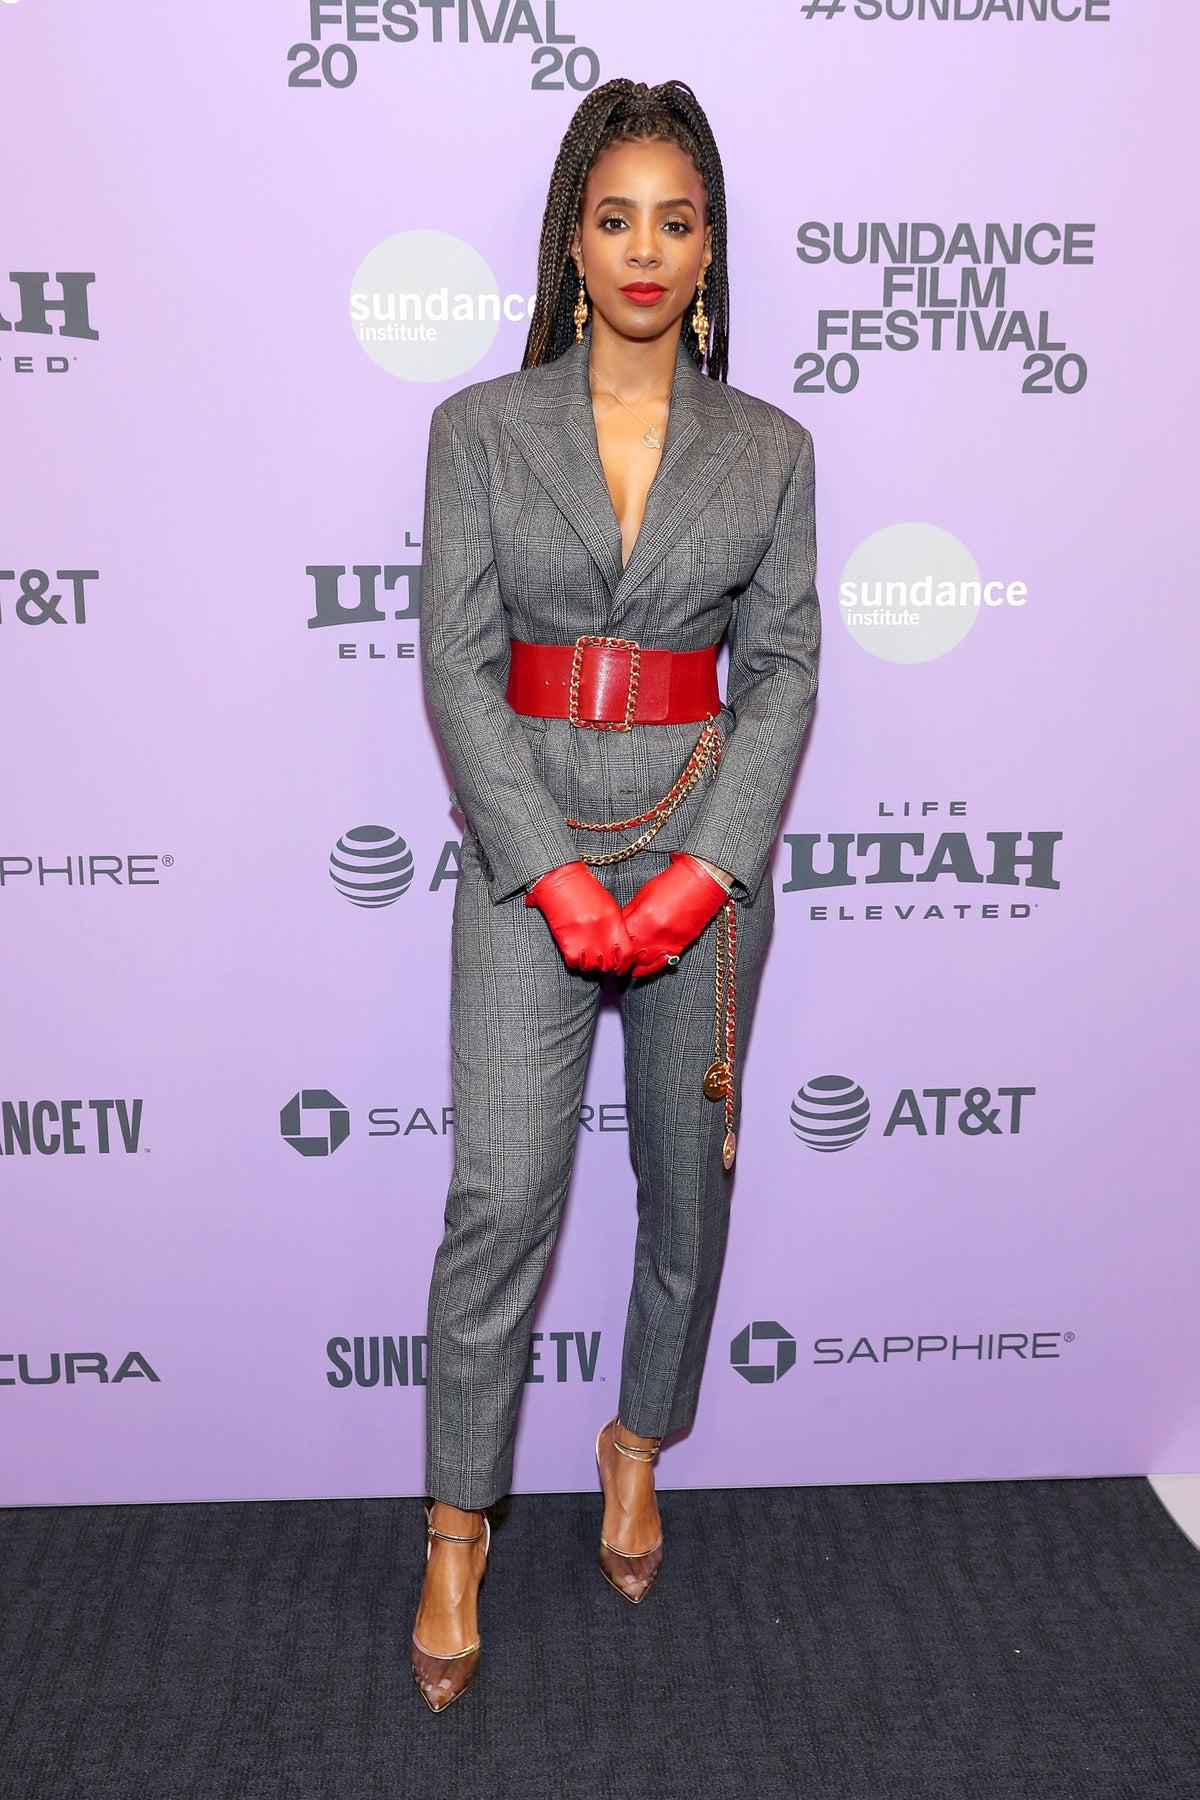 Kelly Rowland at the 2020 Sundance Film